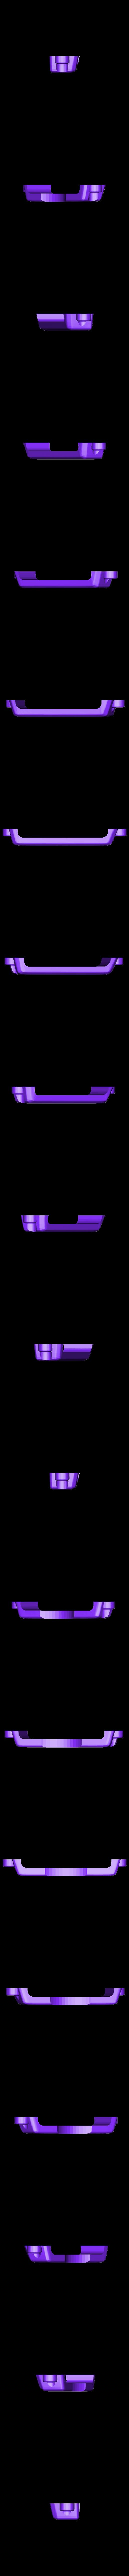 XAir_Bracket_R.stl Download free STL file DJI FPV Goggles X-Air Faceplate integration • Design to 3D print, JTR1